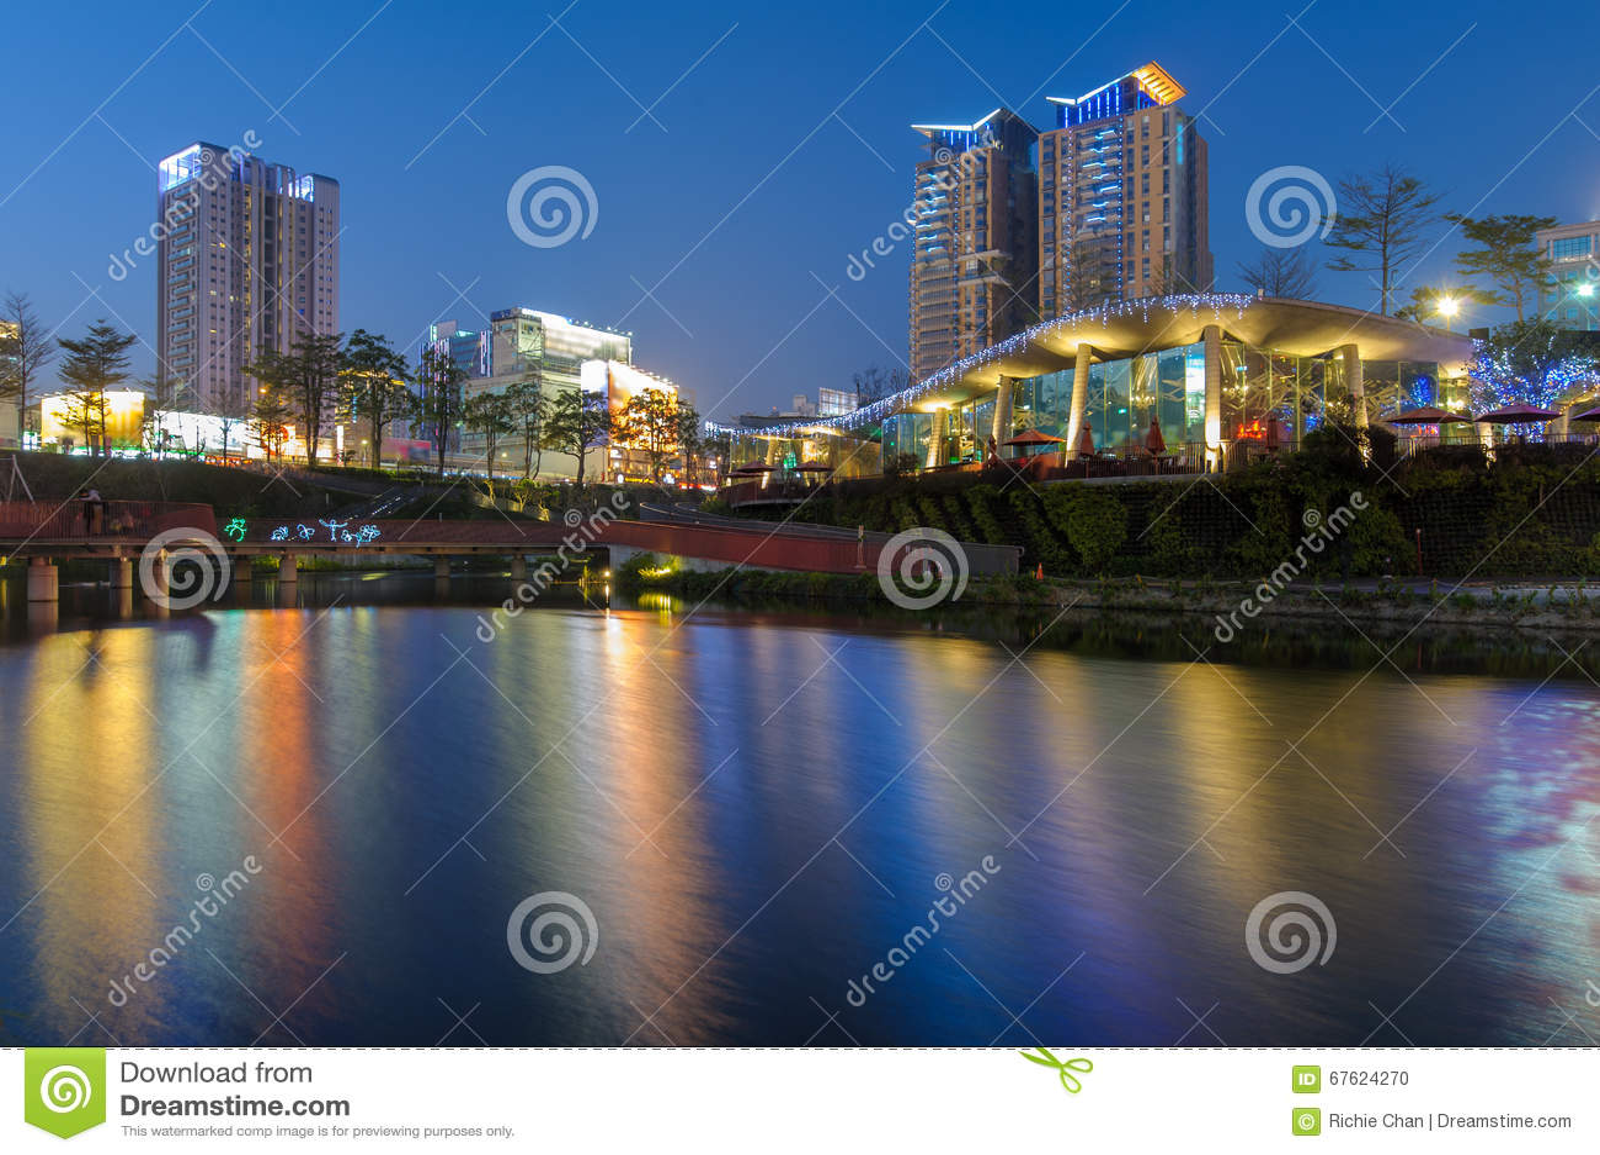 Maple garden in taichung city